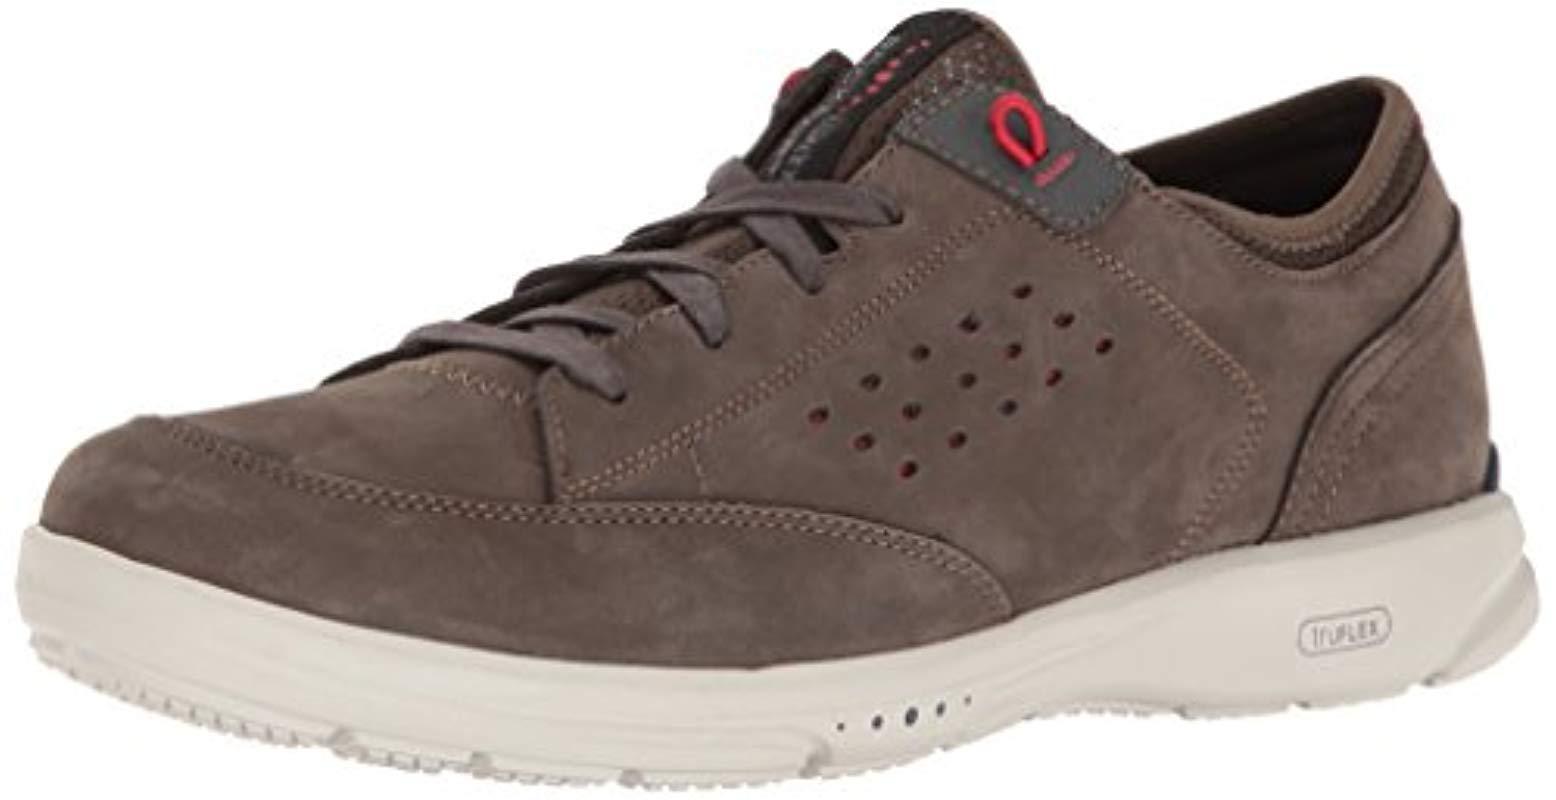 0e5f3190ca96 Lyst - Rockport Truflex Lace To Toe Sneaker in Green for Men - Save 60%